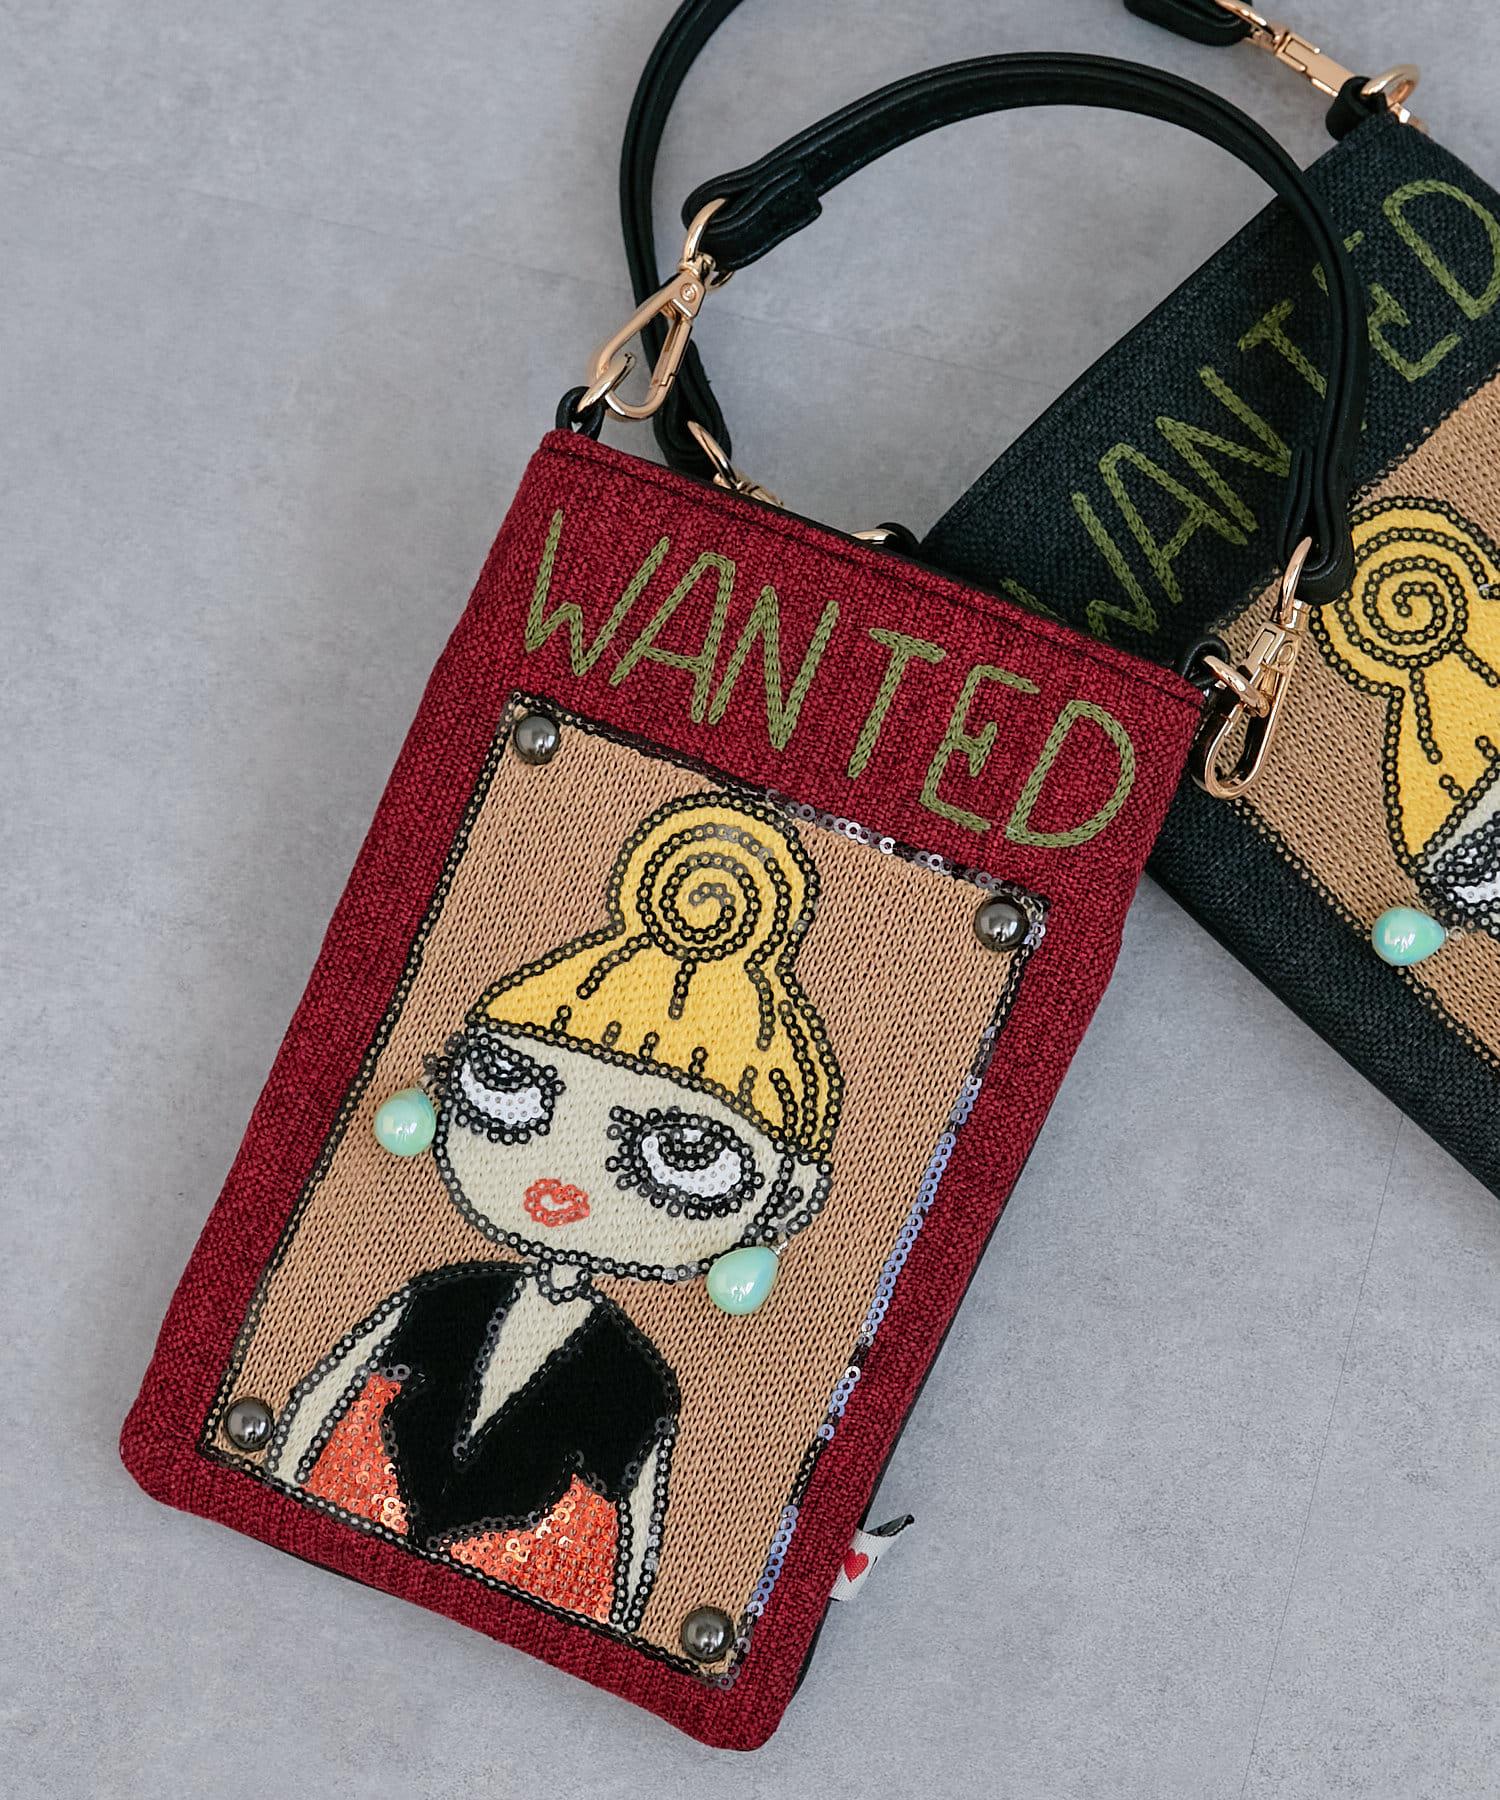 Pal collection(パルコレクション) 《個性派バッグ》ウォンテッドスマホバッグ